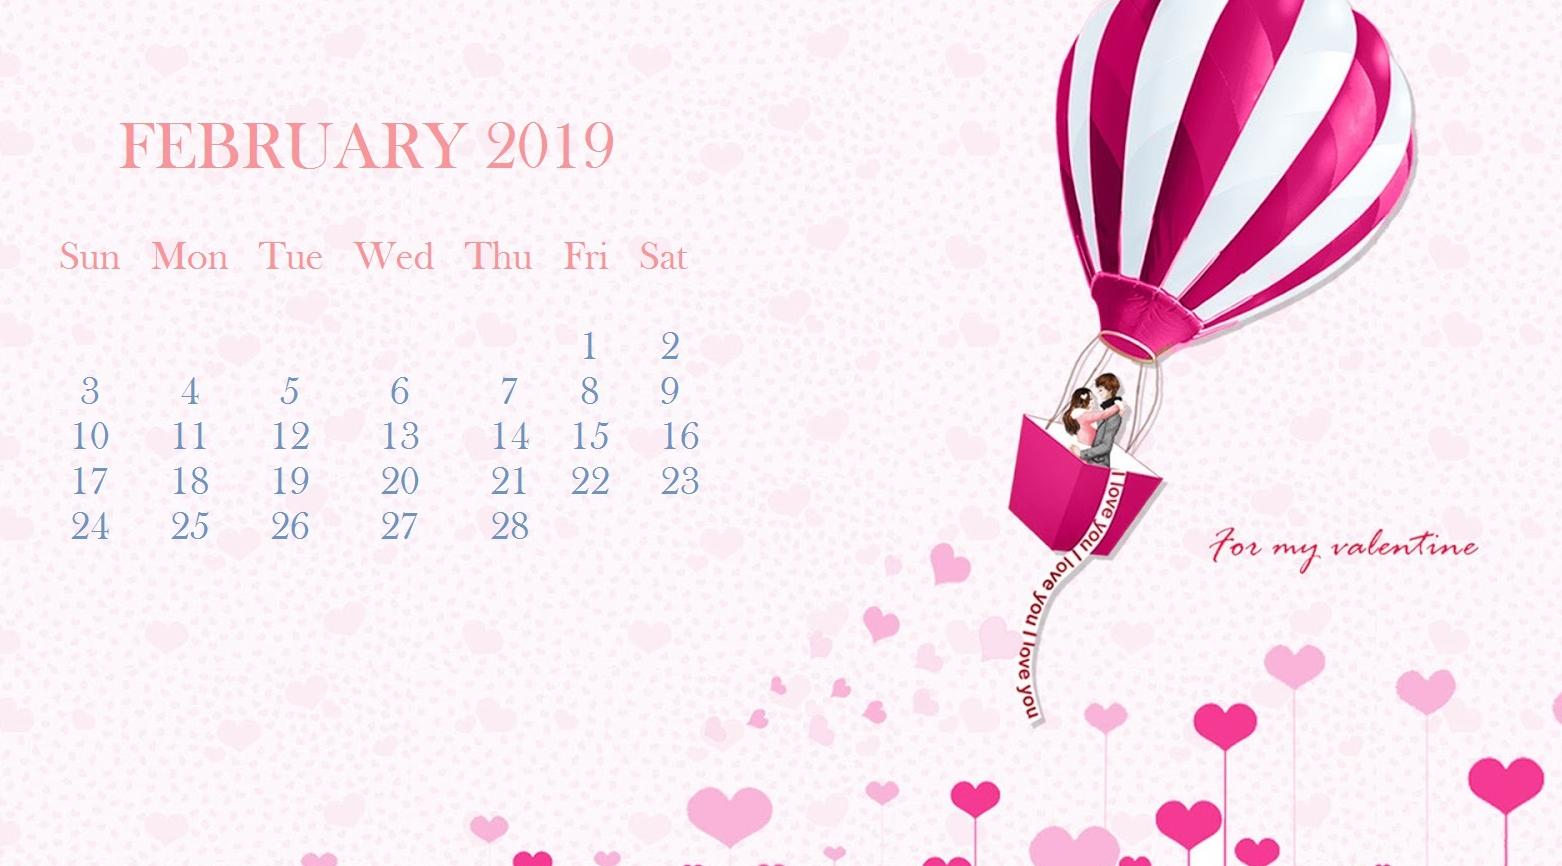 February 2019 Calendar Word Printable – Free Printable 2018 Calendar Feb 9 2019 Calendar